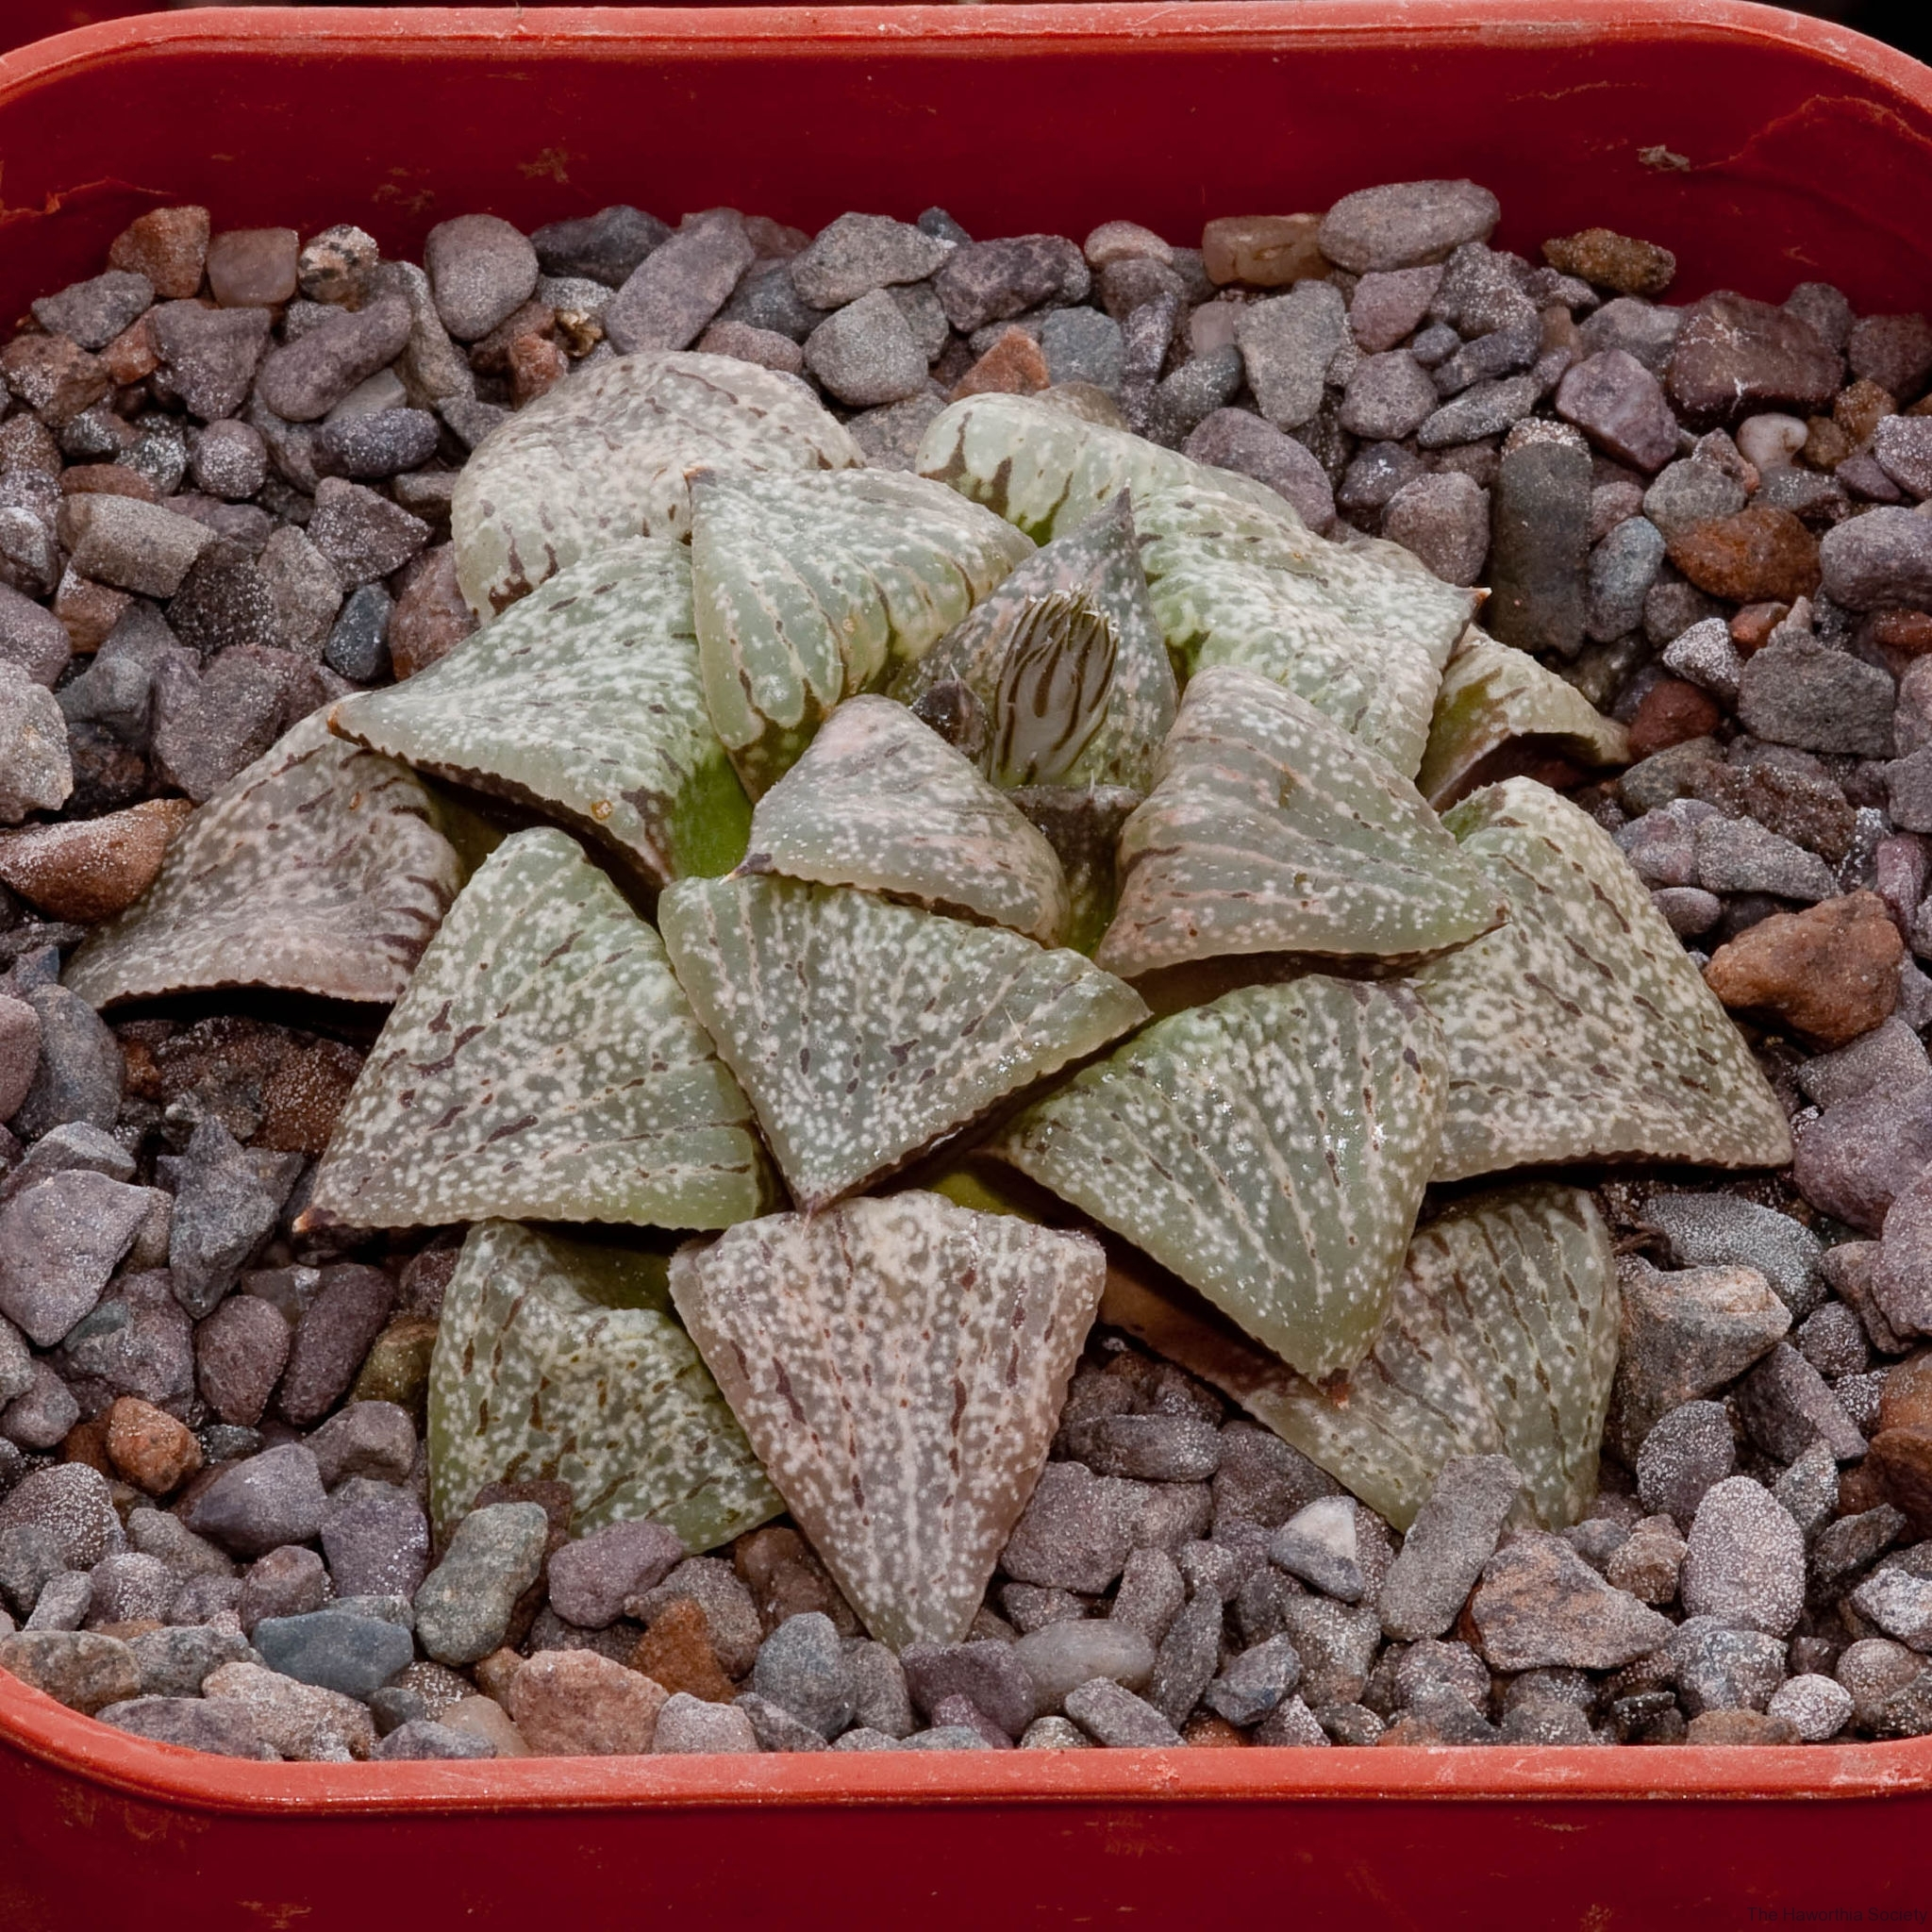 Haworthia picta 'Maze Junior' BH0574 BCSS National Ex Mr Onkuwa